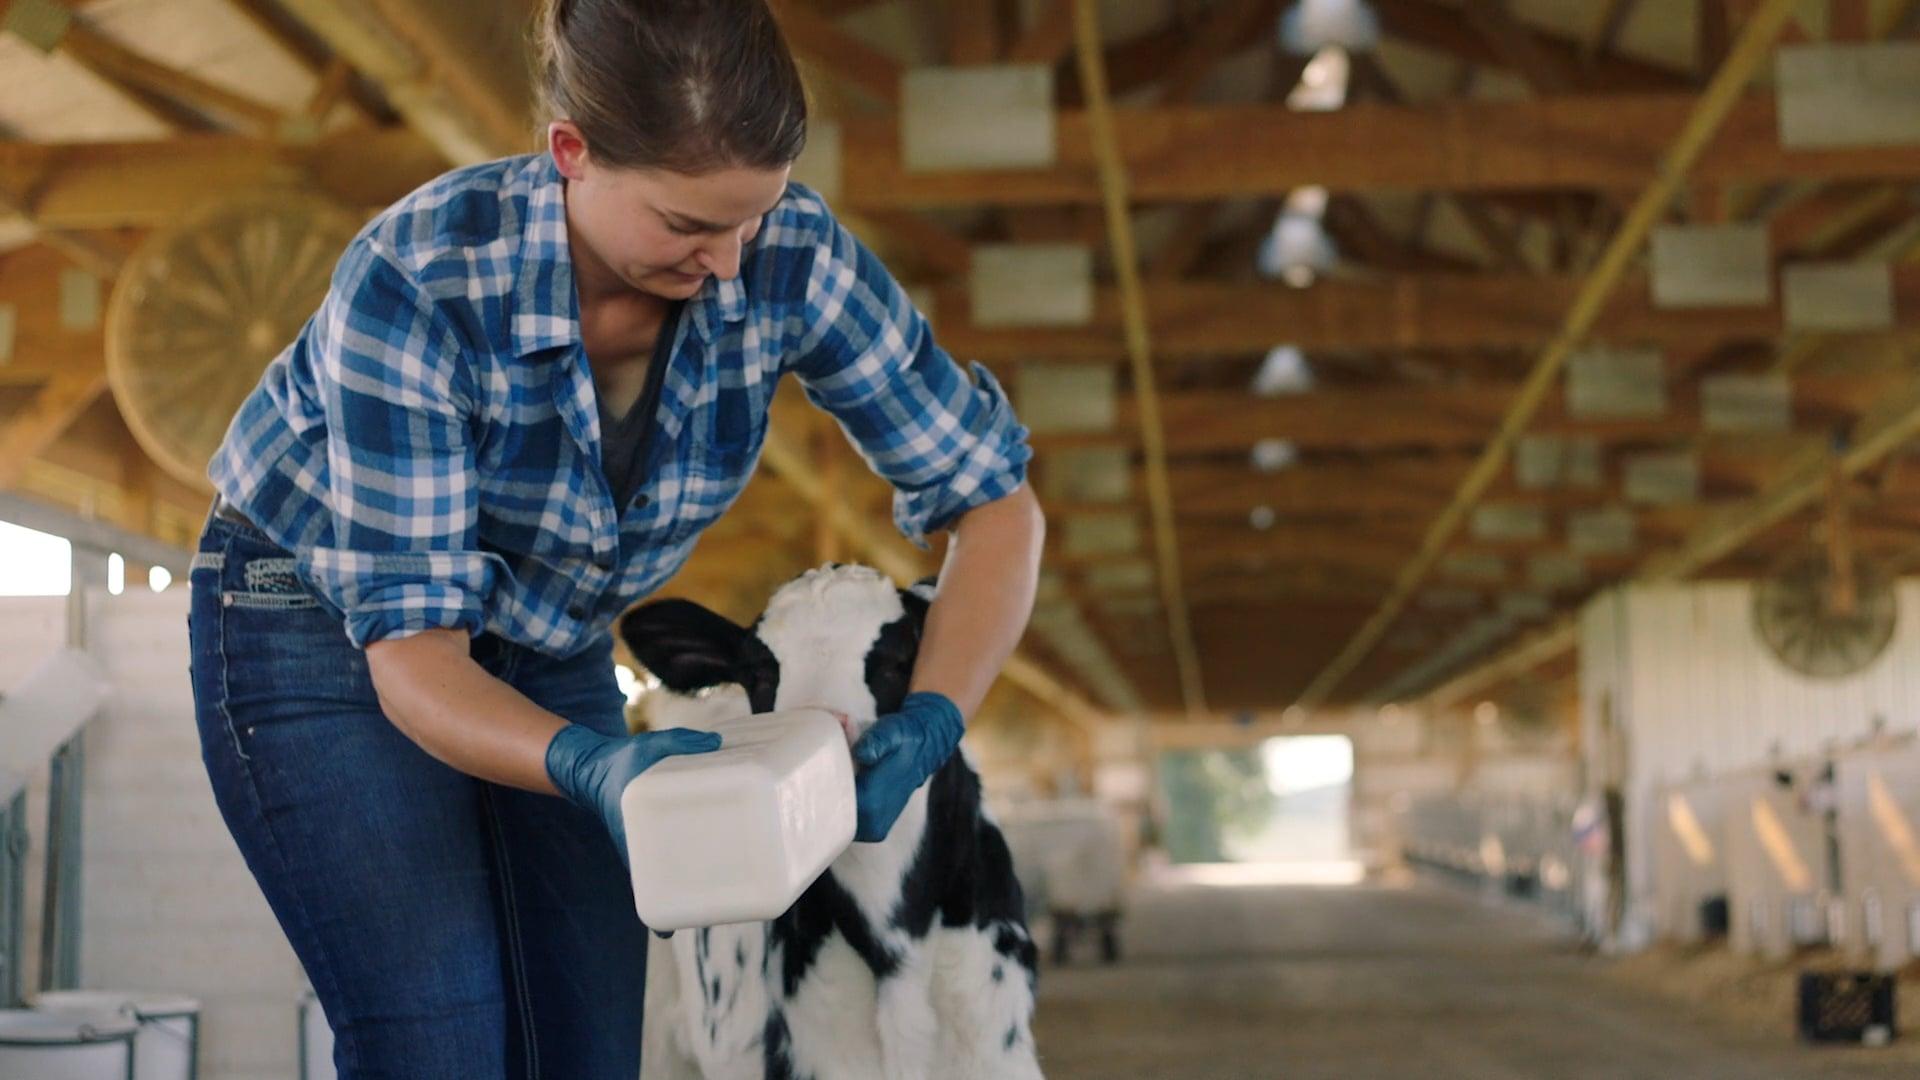 Dairy Farmers Wisconsin - FOLLOW THE LIGHT